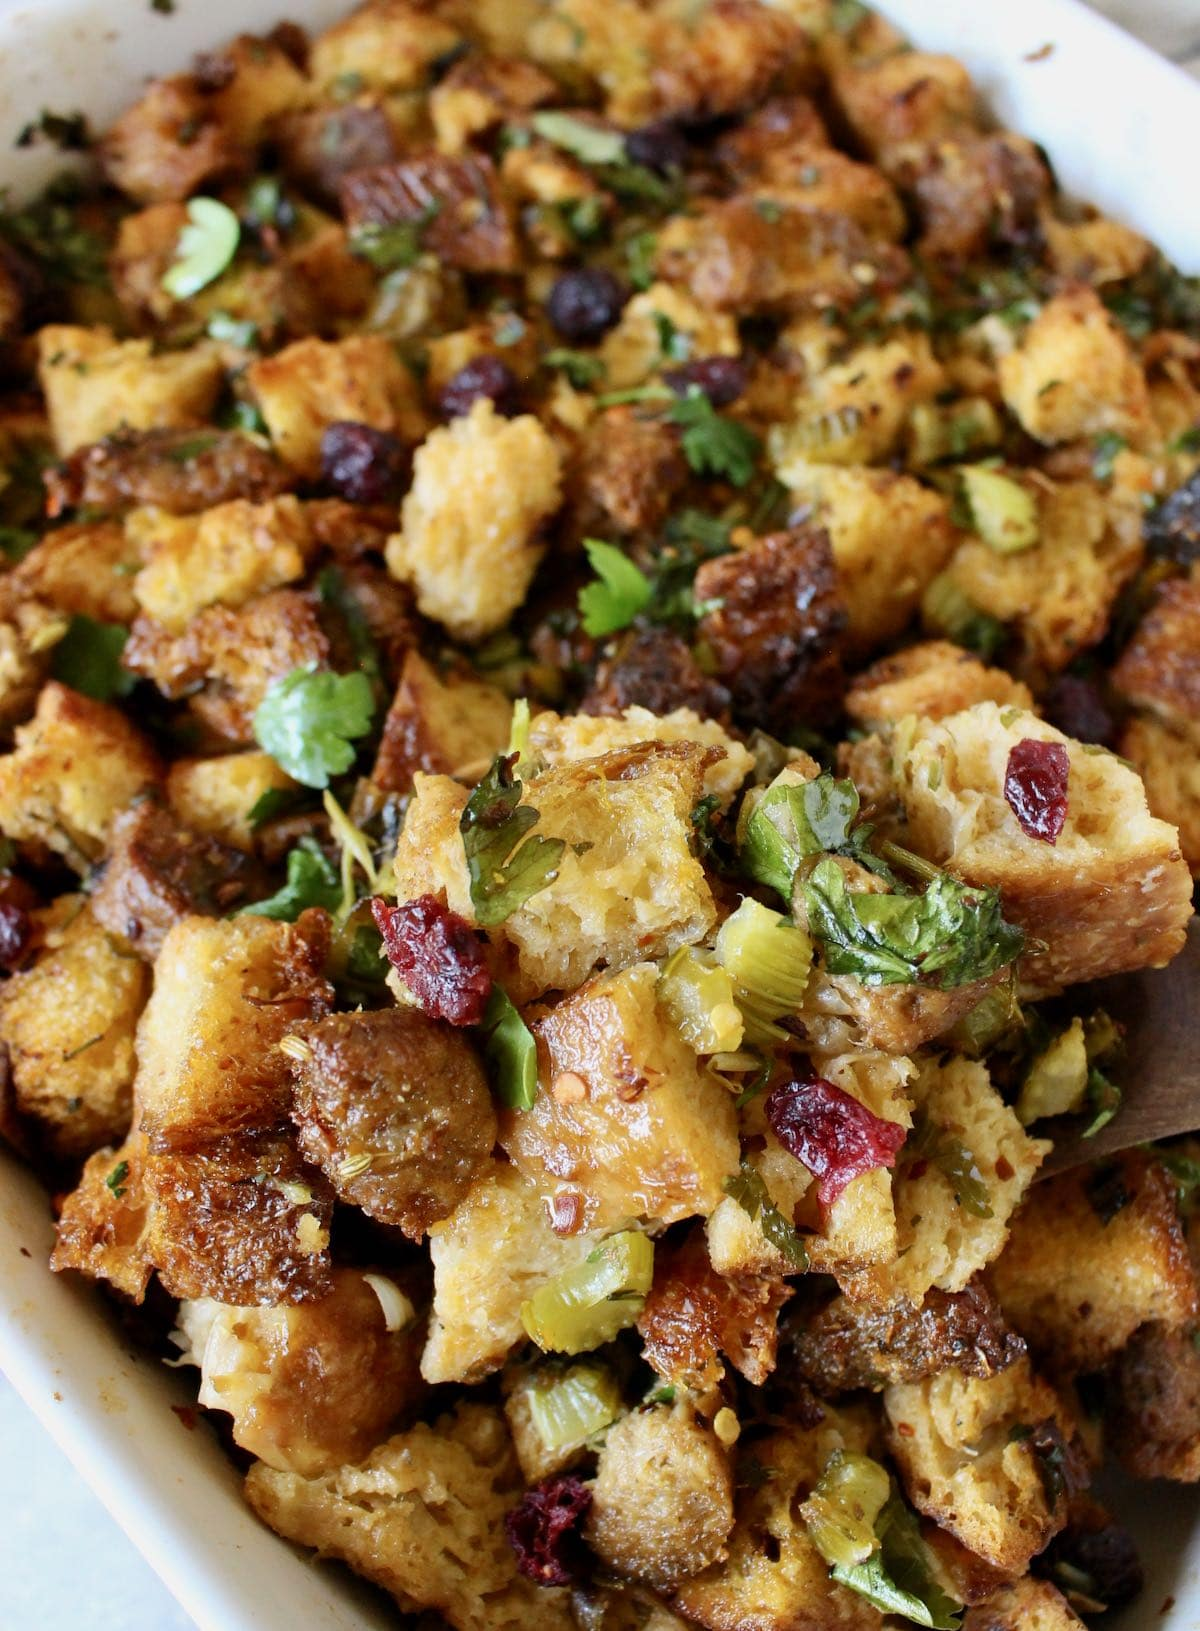 Vegan Stuffing with leeks, beyond sausage, sage, rosemary and cranberries